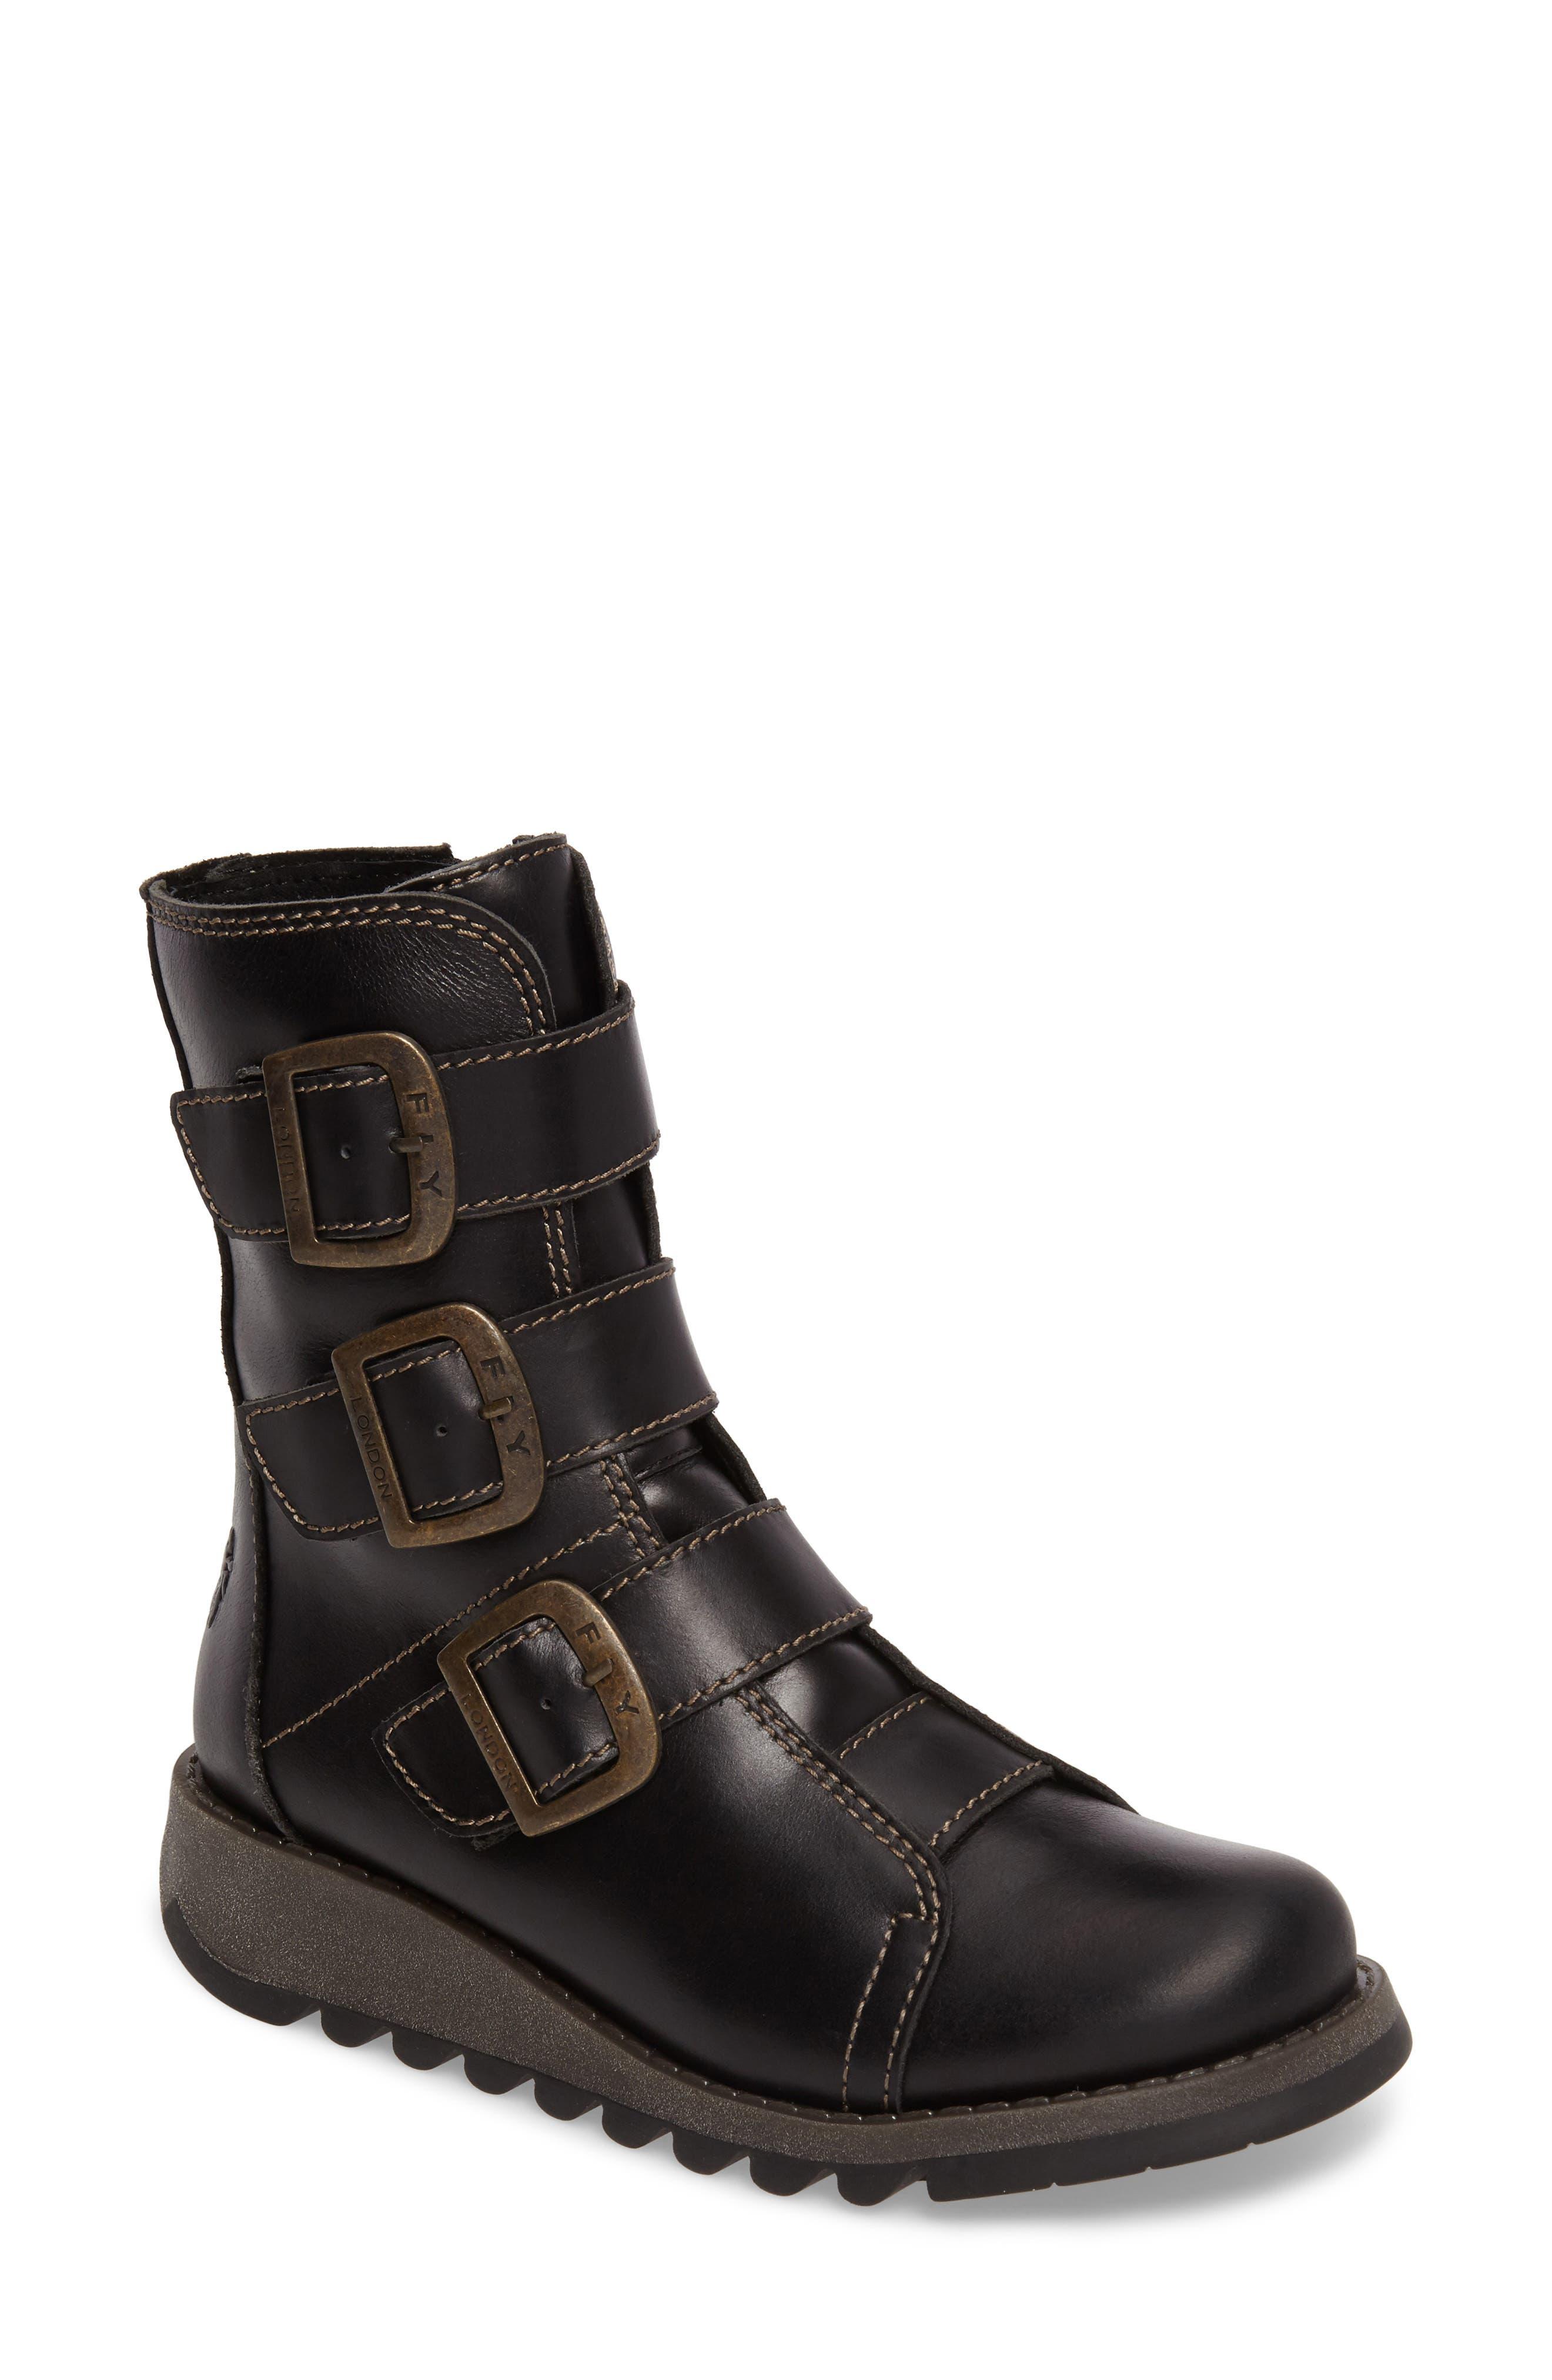 Scop Boot,                         Main,                         color, 001